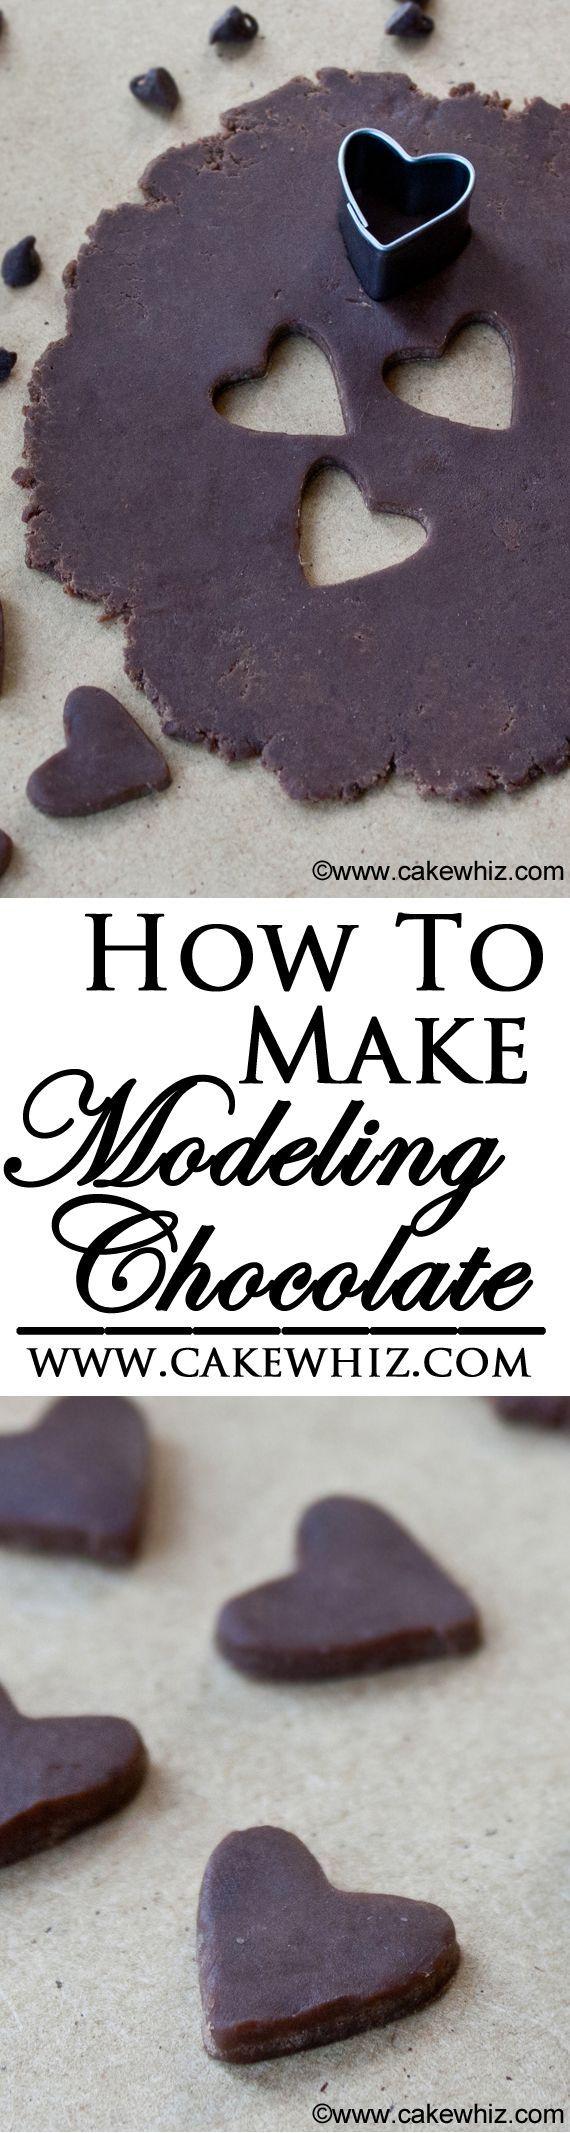 Best 25+ Cake models ideas on Pinterest | Whale food, Fondant ...